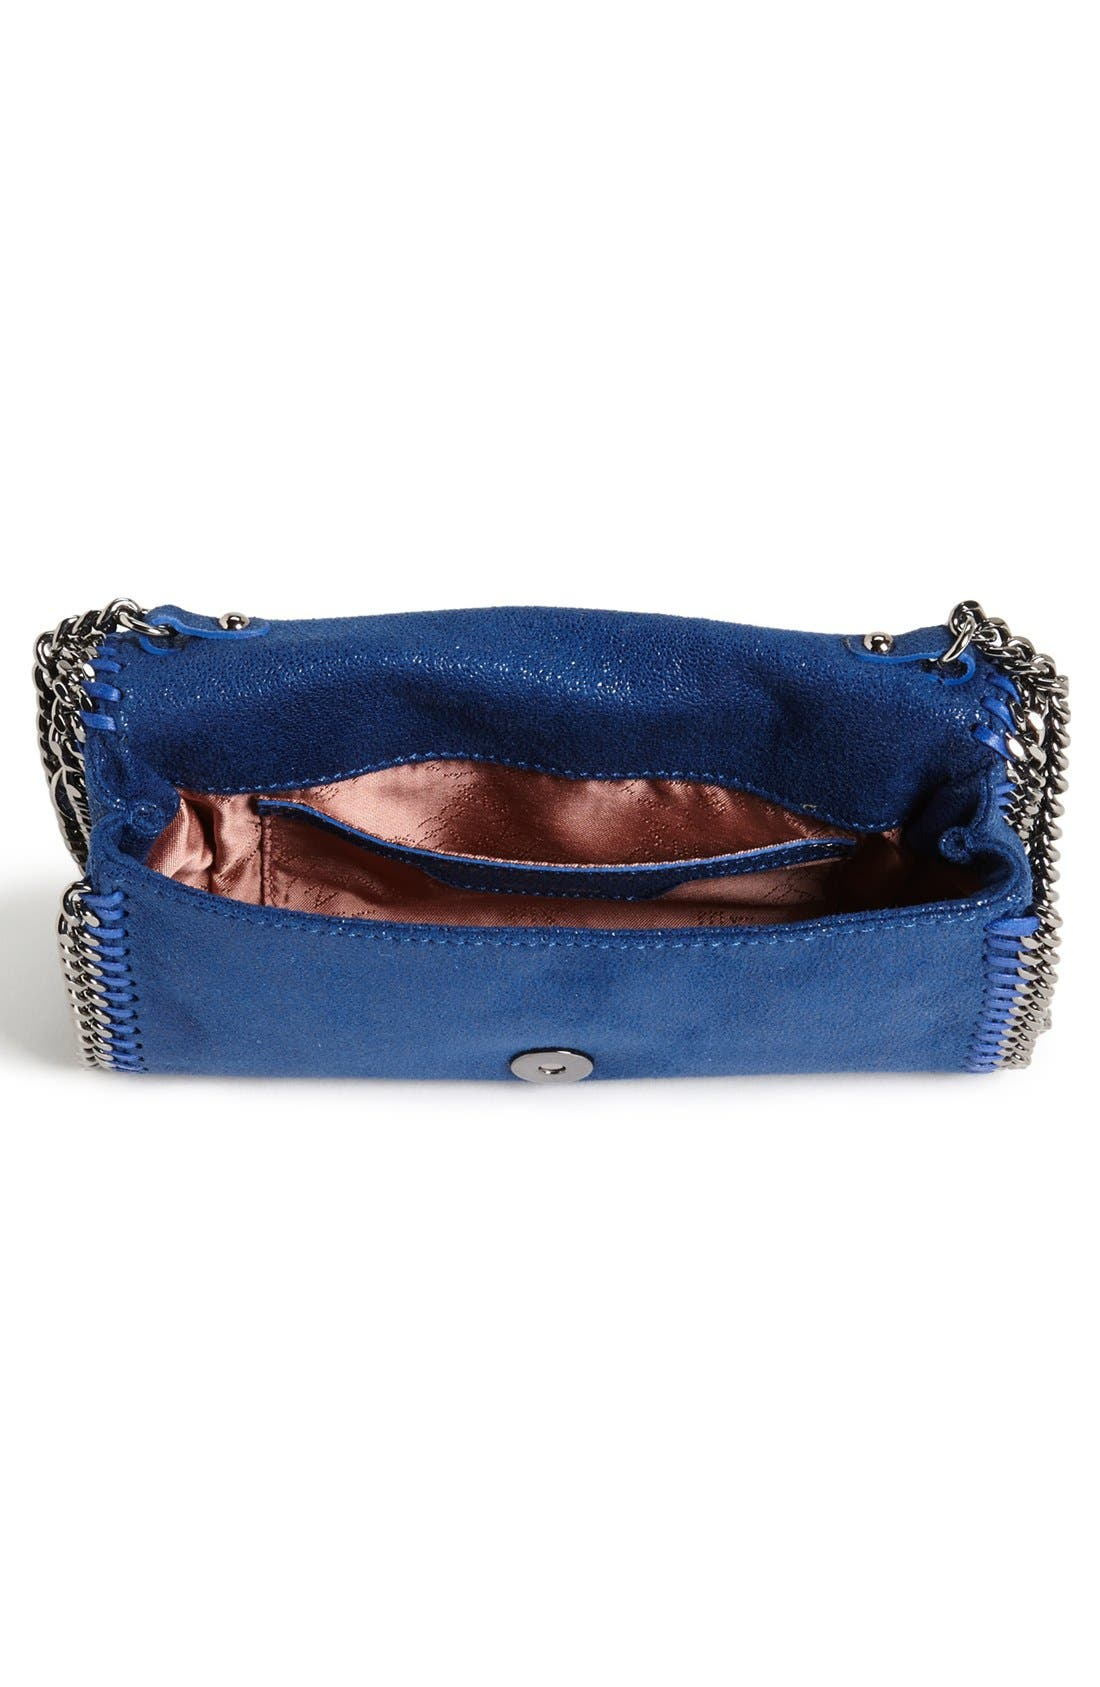 Alternate Image 3  - Stella McCartney 'Falabella - Shaggy Deer' Faux Leather Crossbody Bag